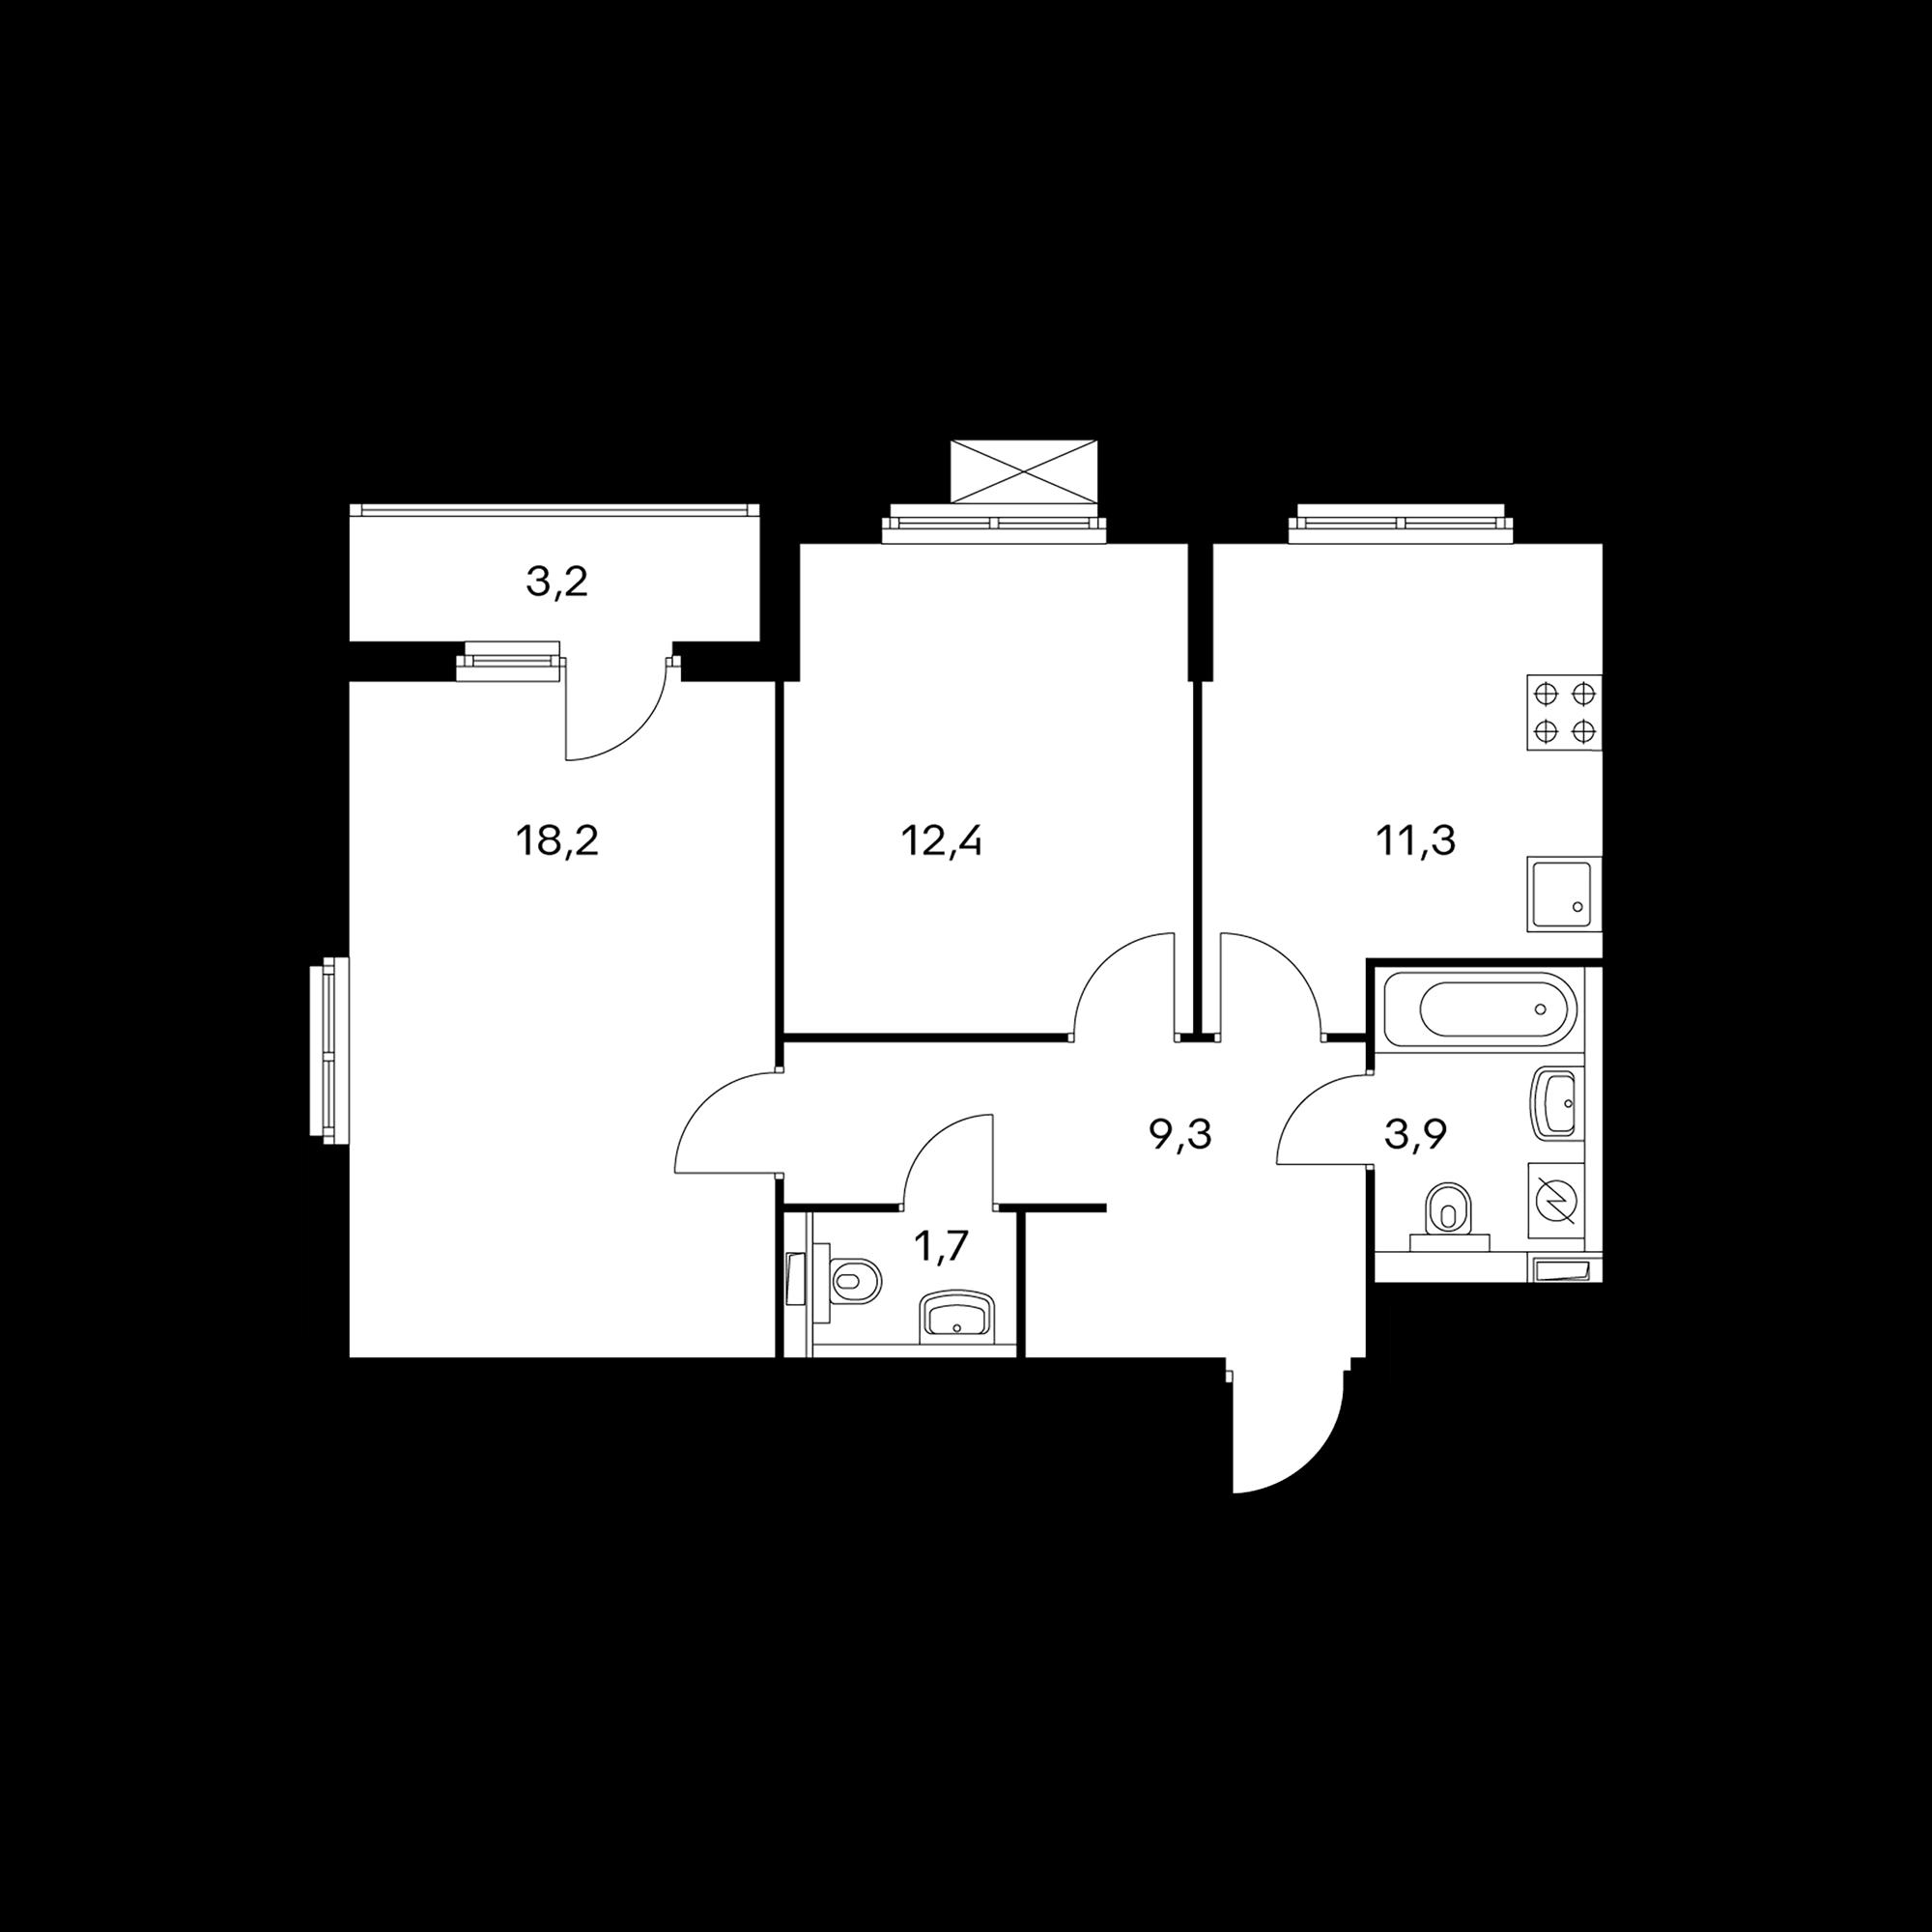 2KM6_10.2-1_T_AL